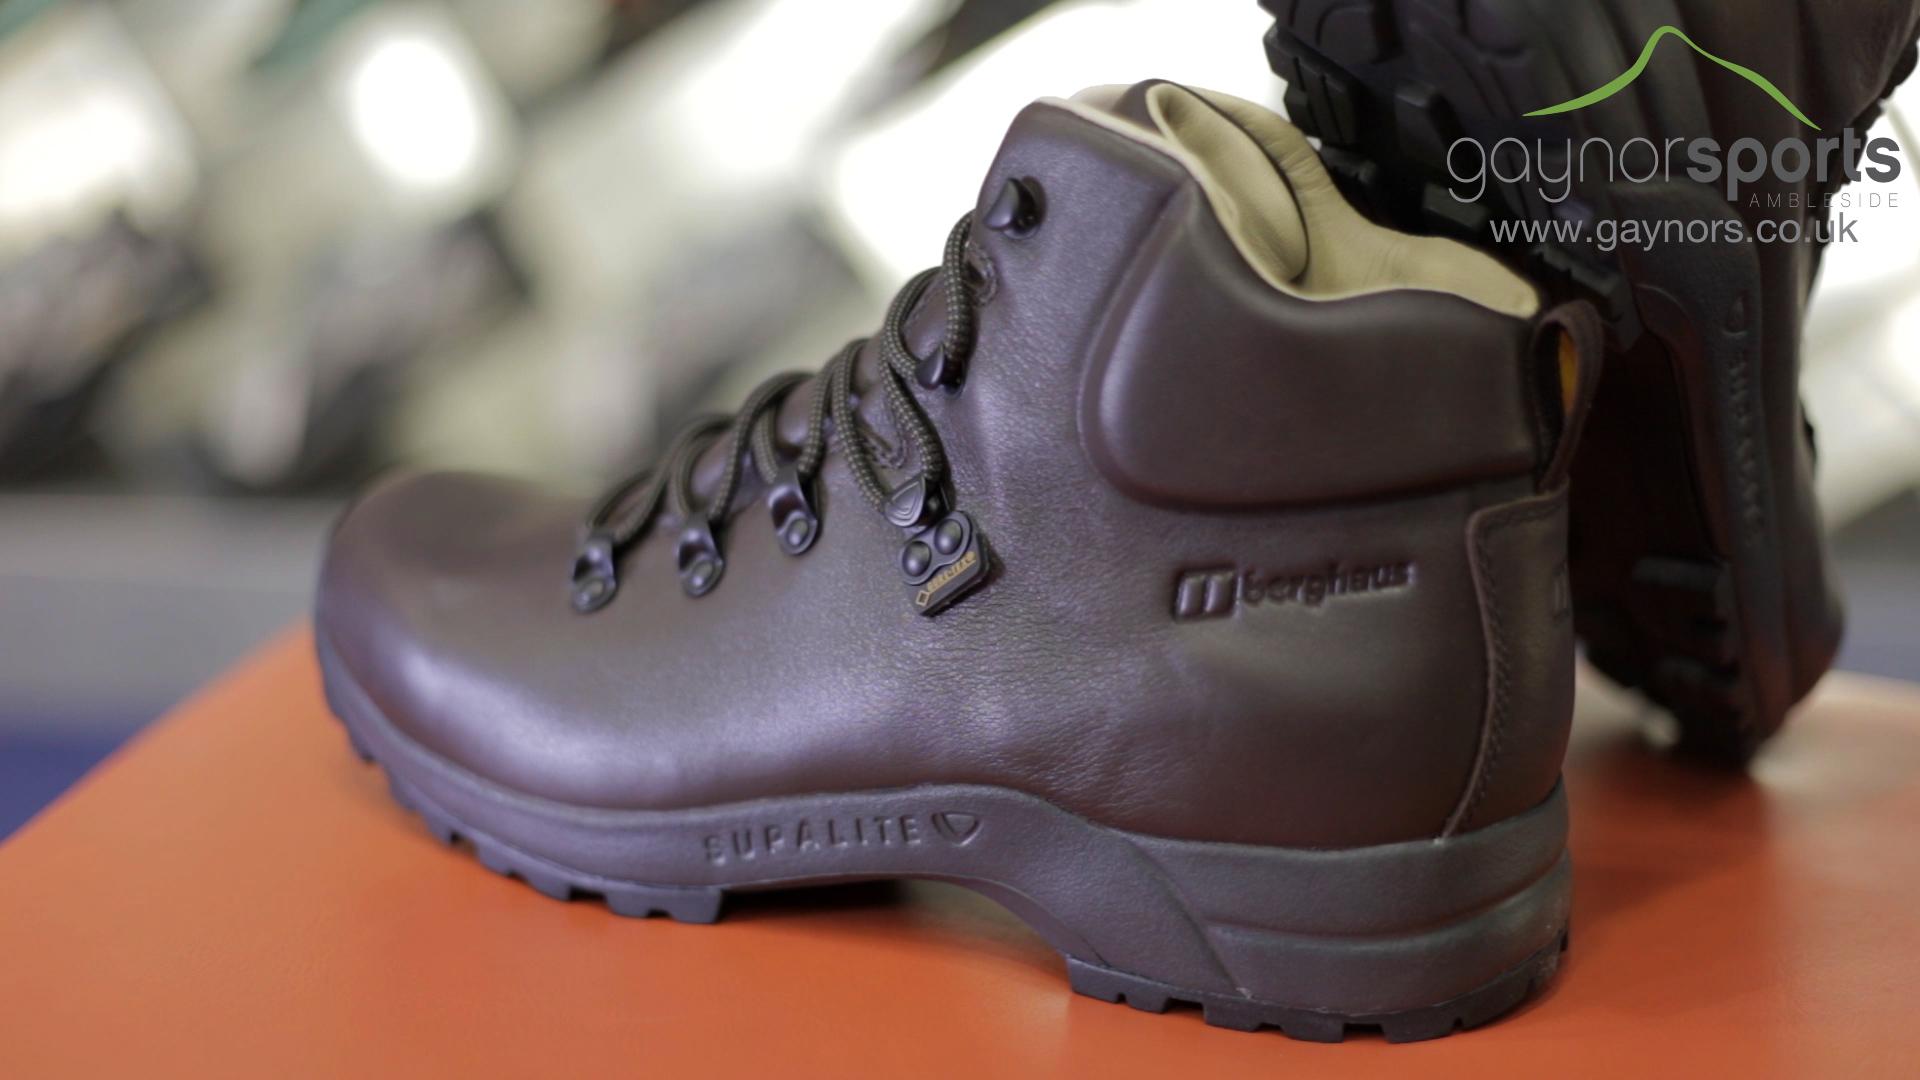 98dbdf7c918f Berghaus Supalite walking boot.